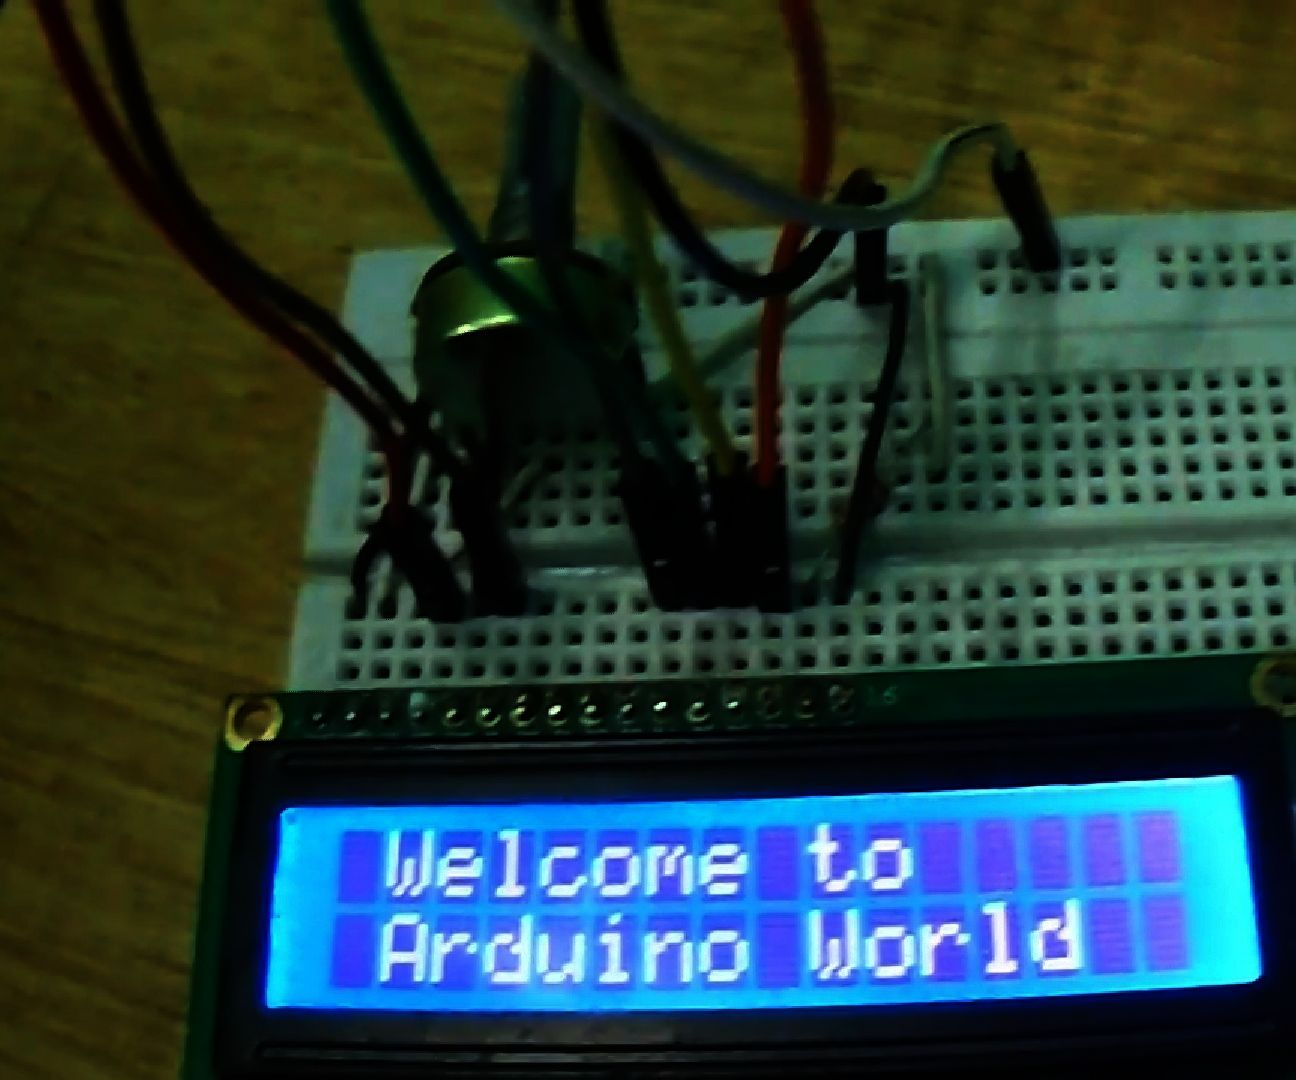 Arduino LCD 16x2 Tutorial   Interfacing 1602 LCD Display With Arduino Uno